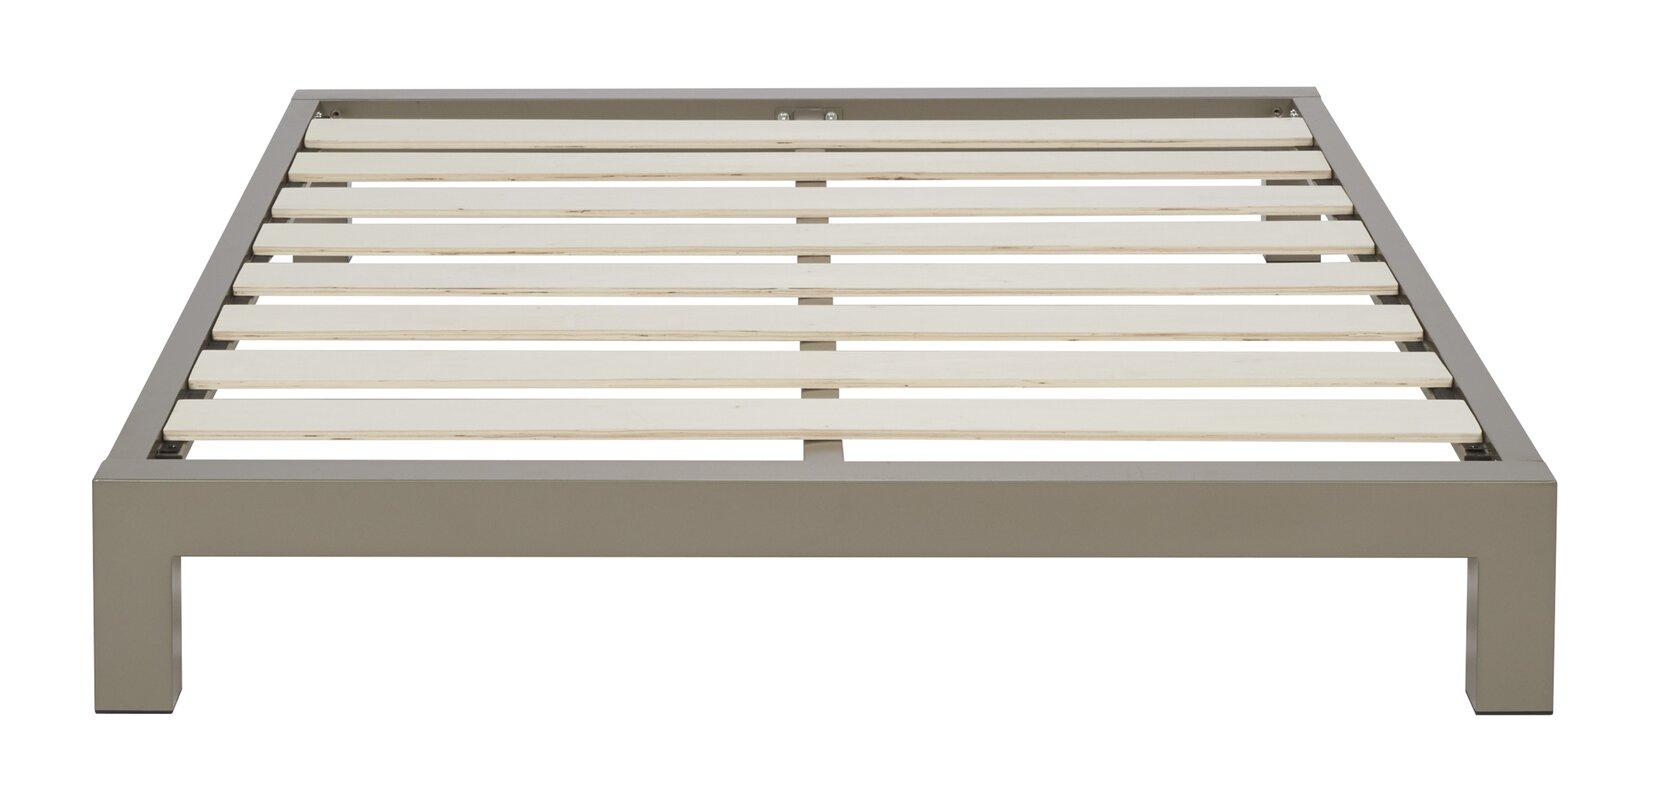 Queen Platform Bed Frames in style furnishings stella bed frame & reviews | wayfair